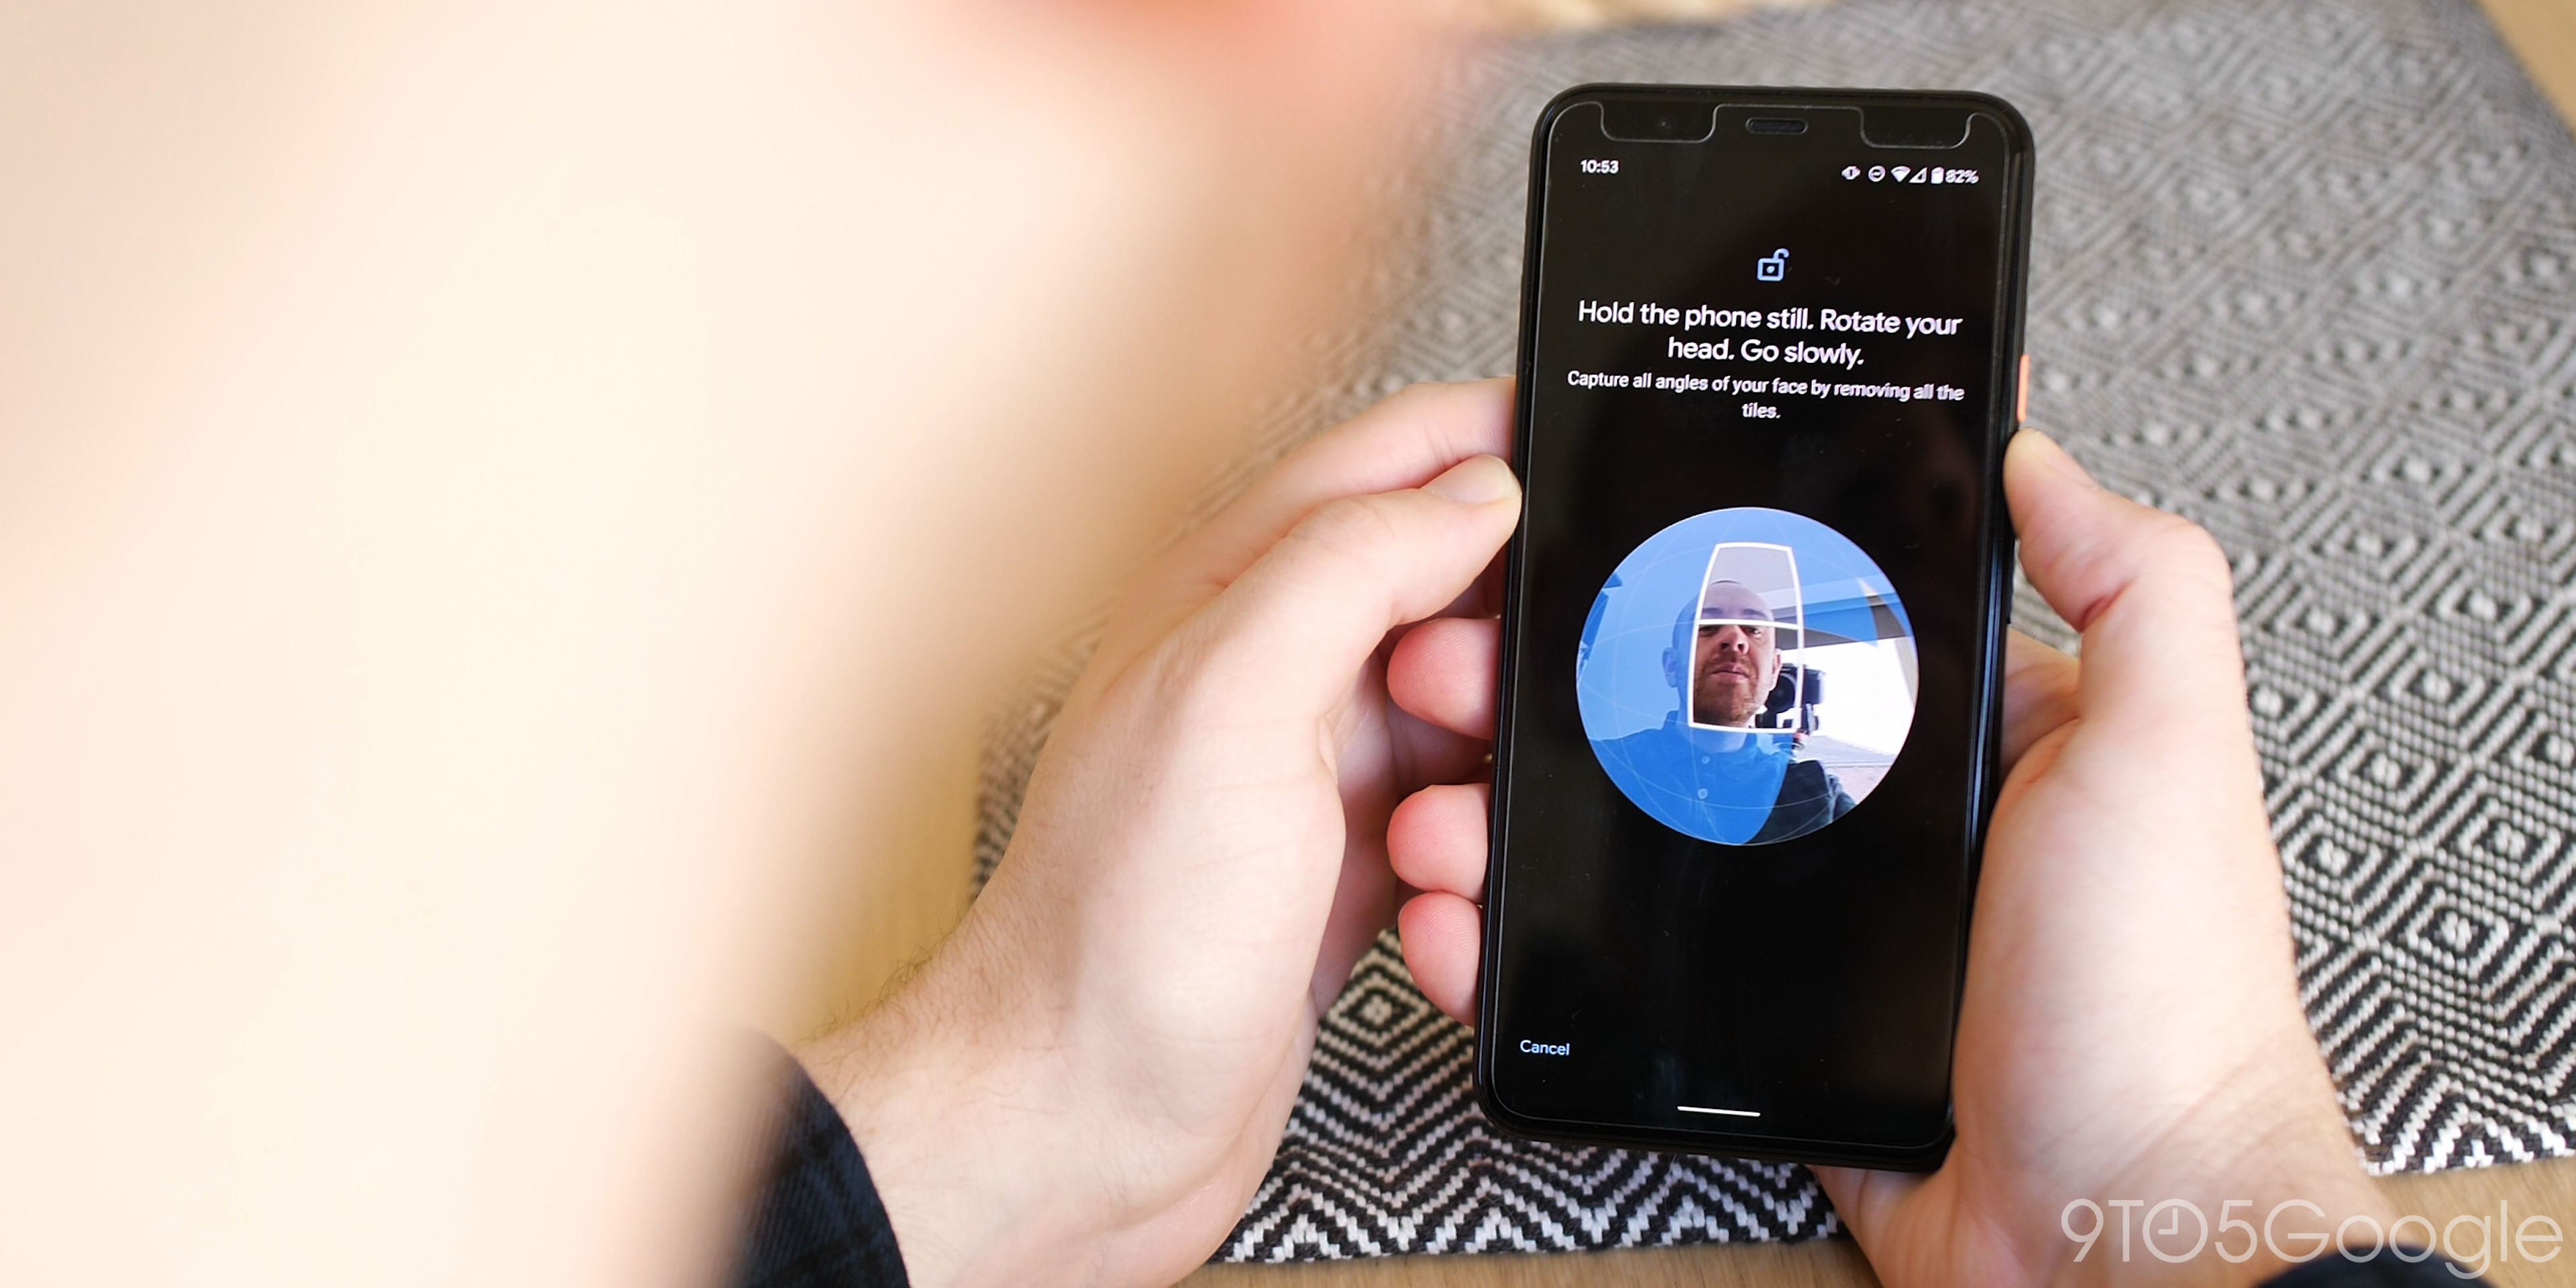 Pixel 4 XL face unlock registration